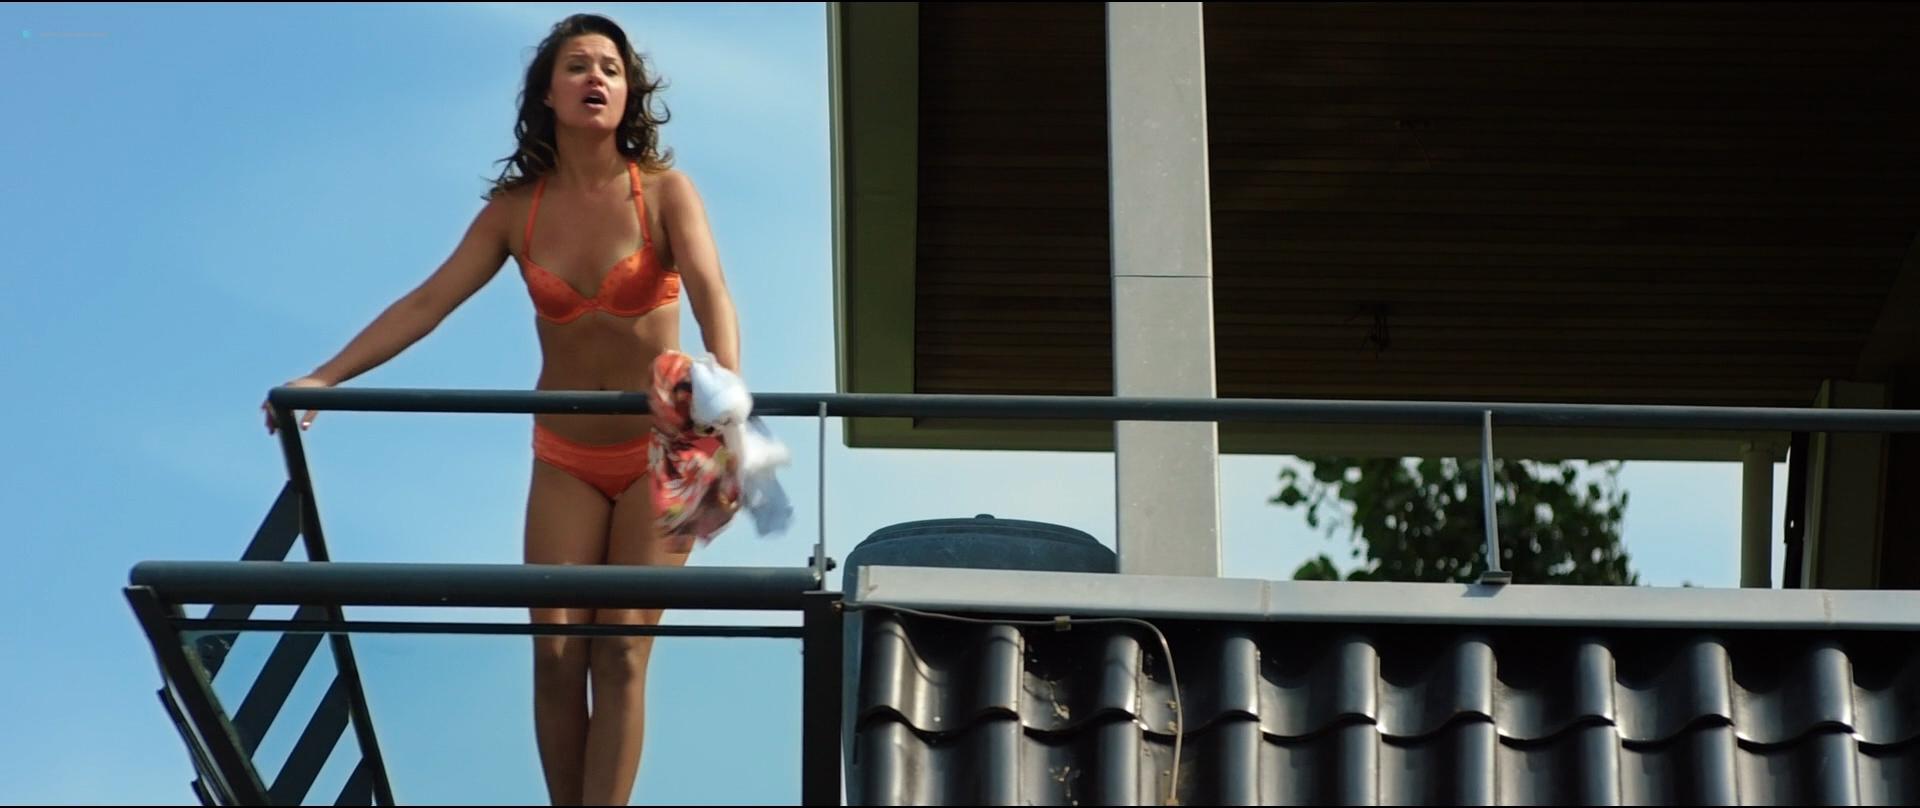 Holly Mae Brood hot and sexy Carolien Spoor, Marly van der Velden nude sex - Sneekweek (NL-2016) HD 1080p BluRay (12)